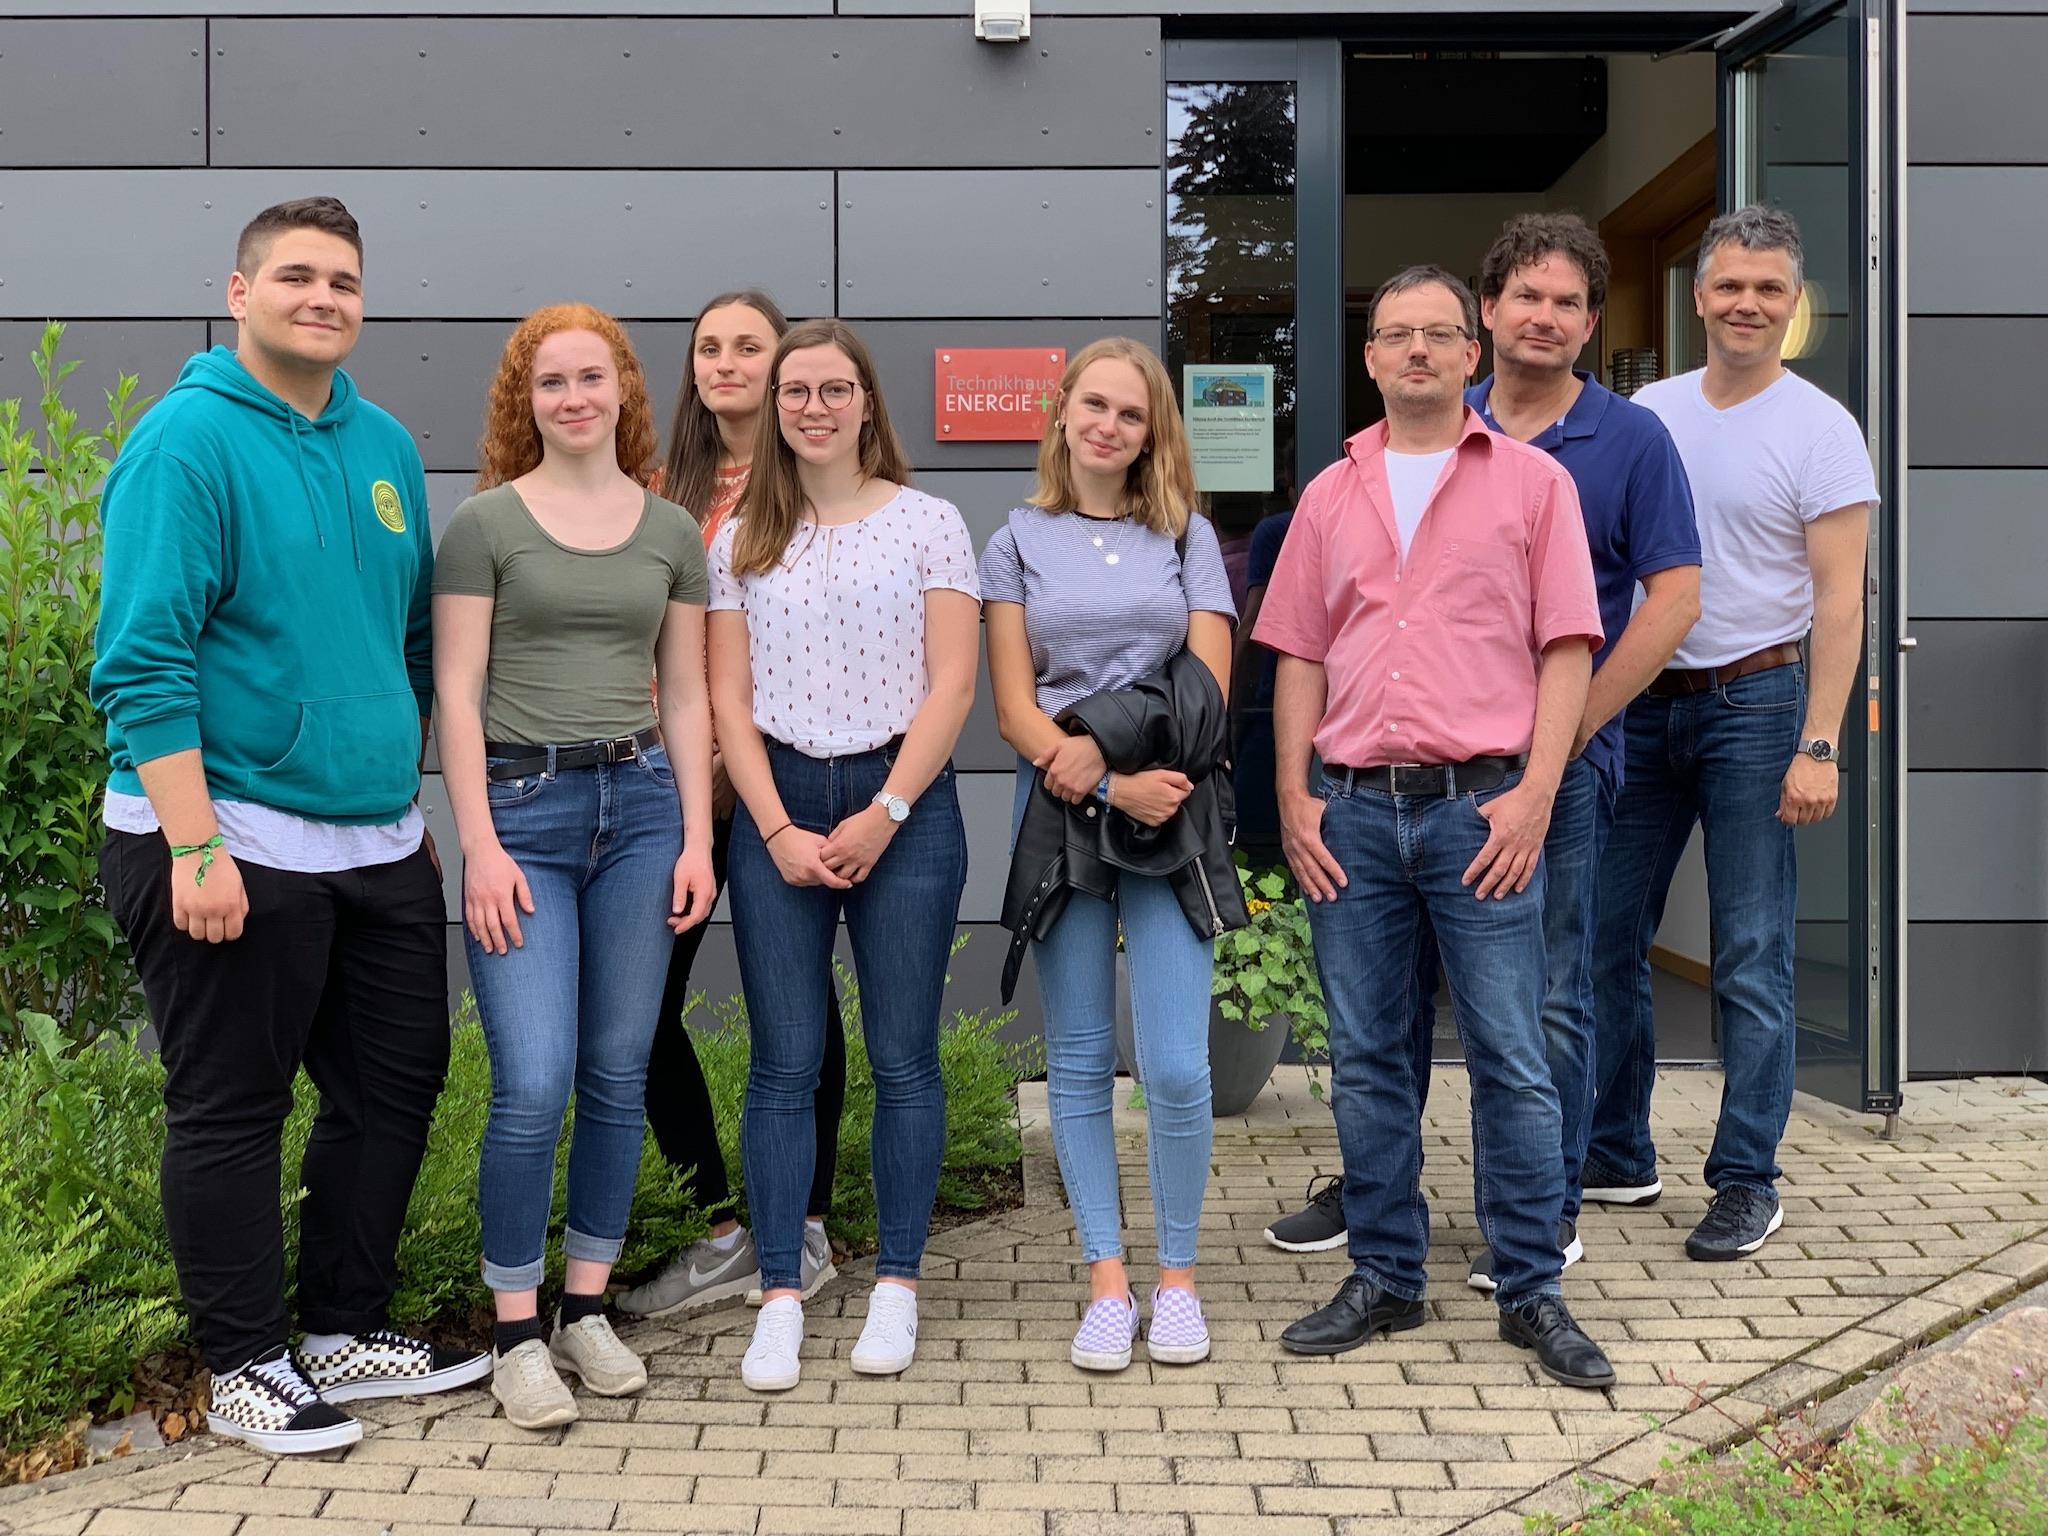 Besuch Technikhaus KSR fff 20190611